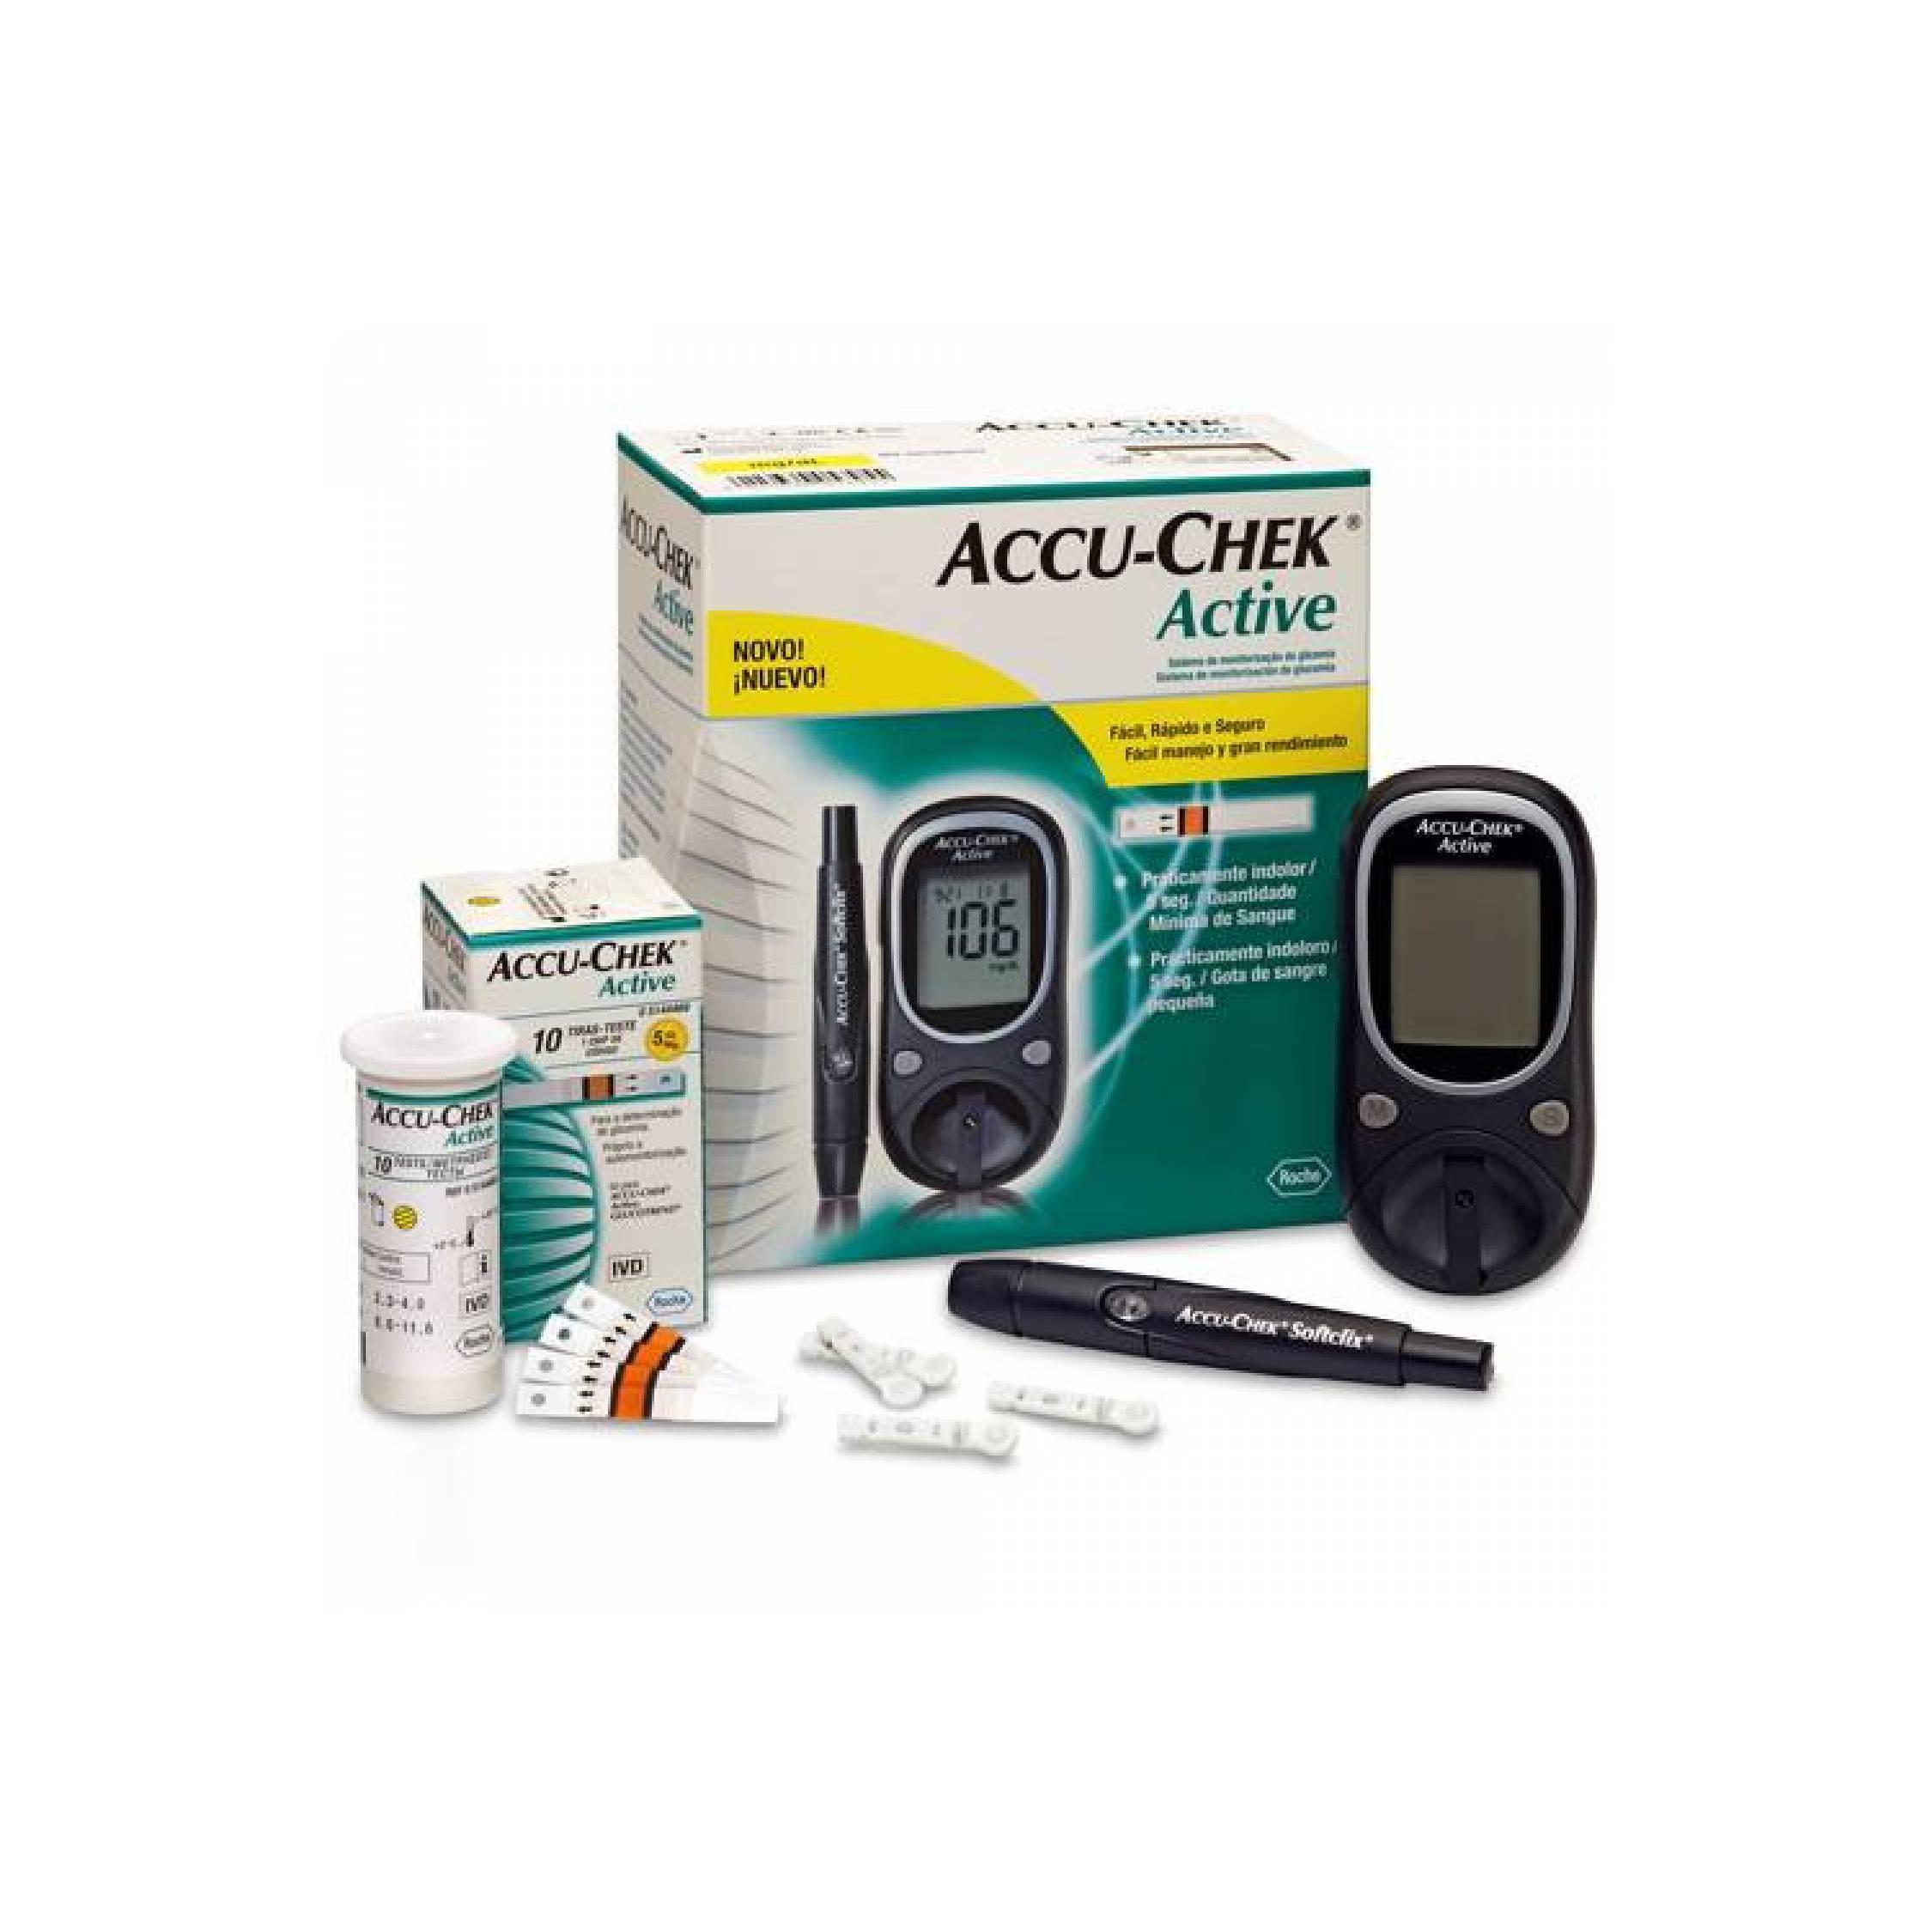 Harga Jual Accu Chek Active Family Pack Alat Tes Gula Darah 400000 Check Monitor Bebas Nyeri Roche Glucose